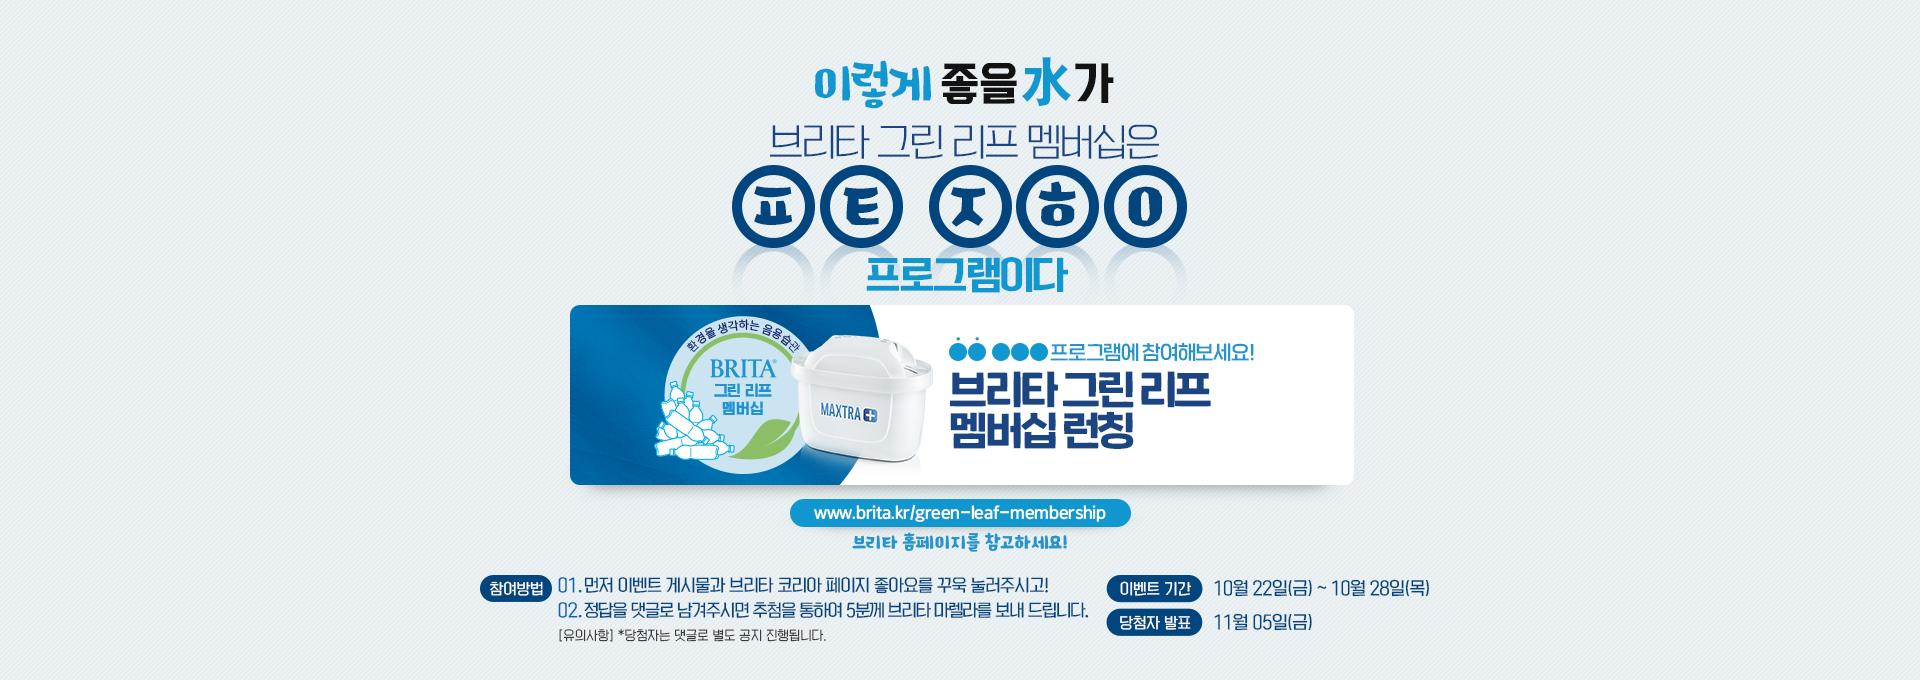 Promotion Banner_September 2021